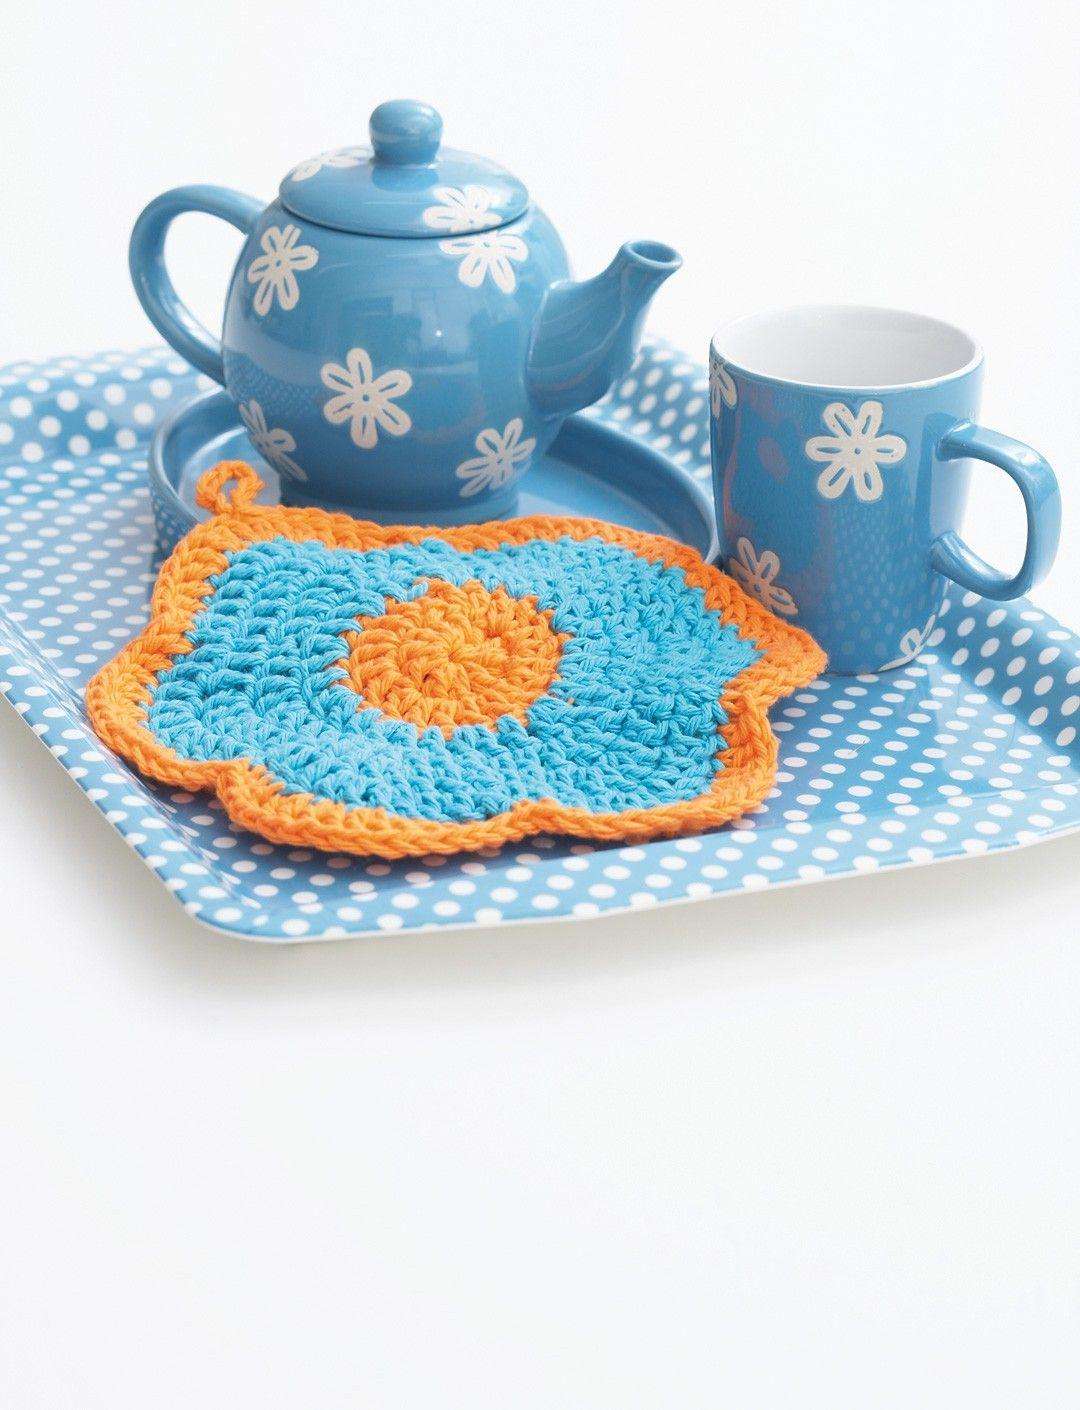 Yarnspirations.com - Bernat Primrose Dishcloth - Patterns ...